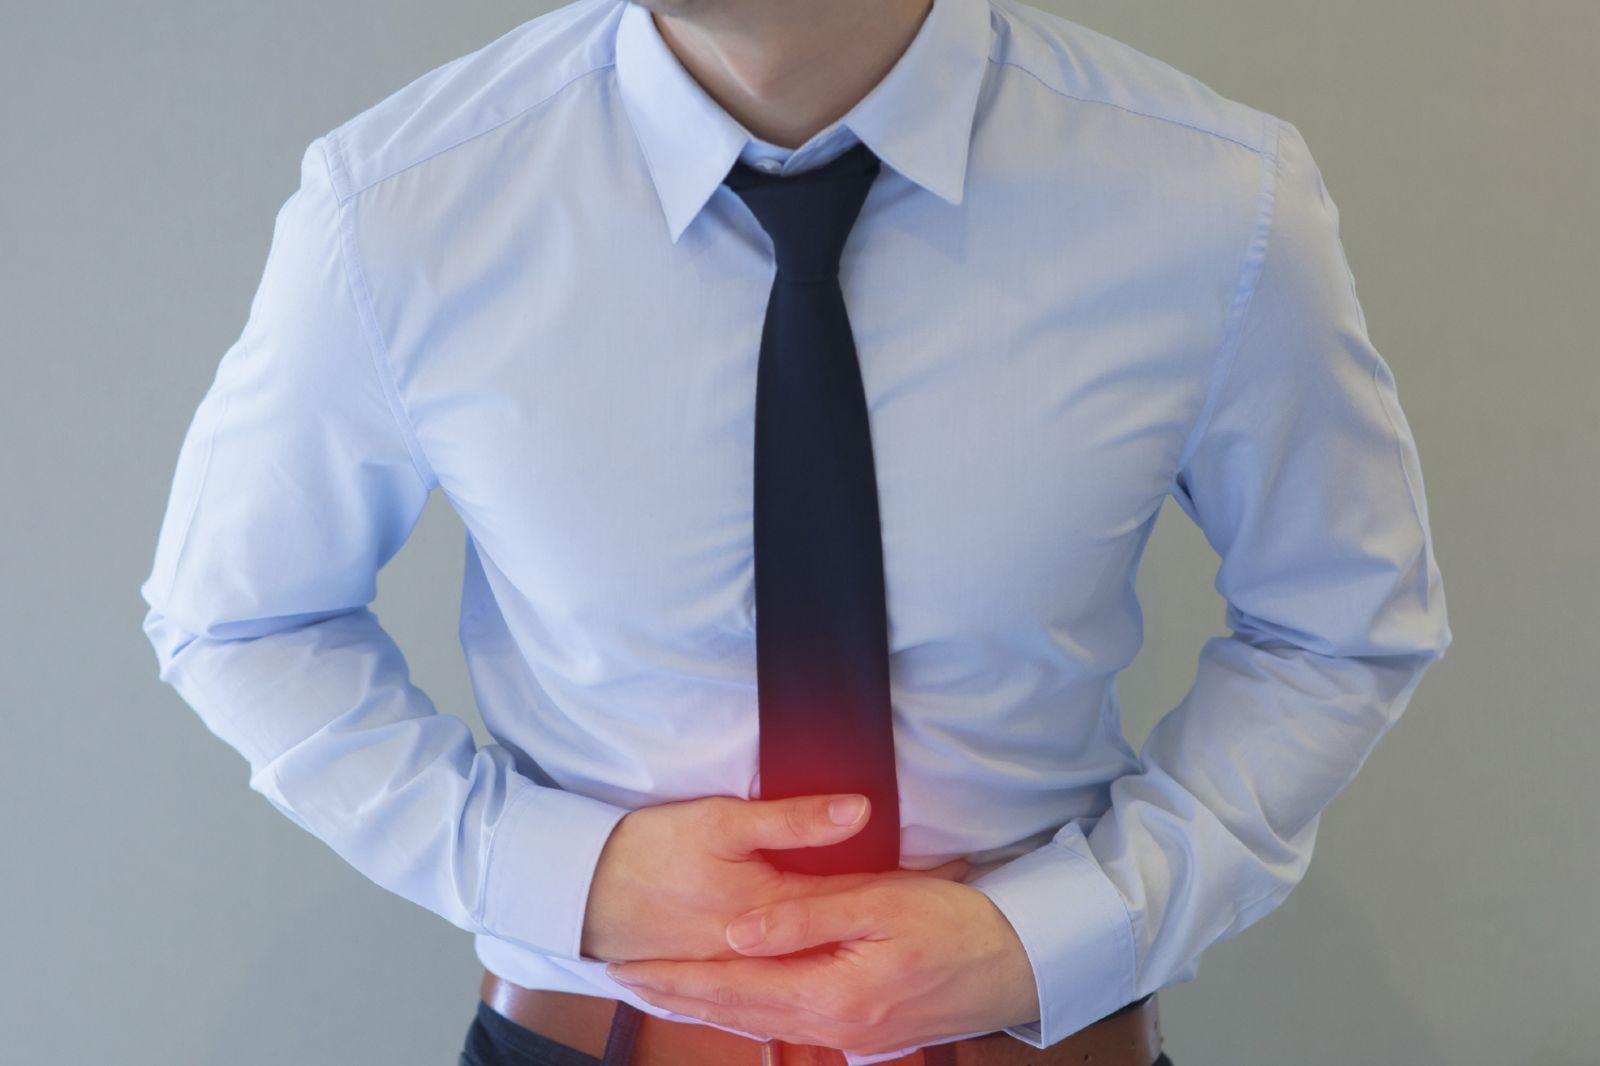 Long-term acid reflux